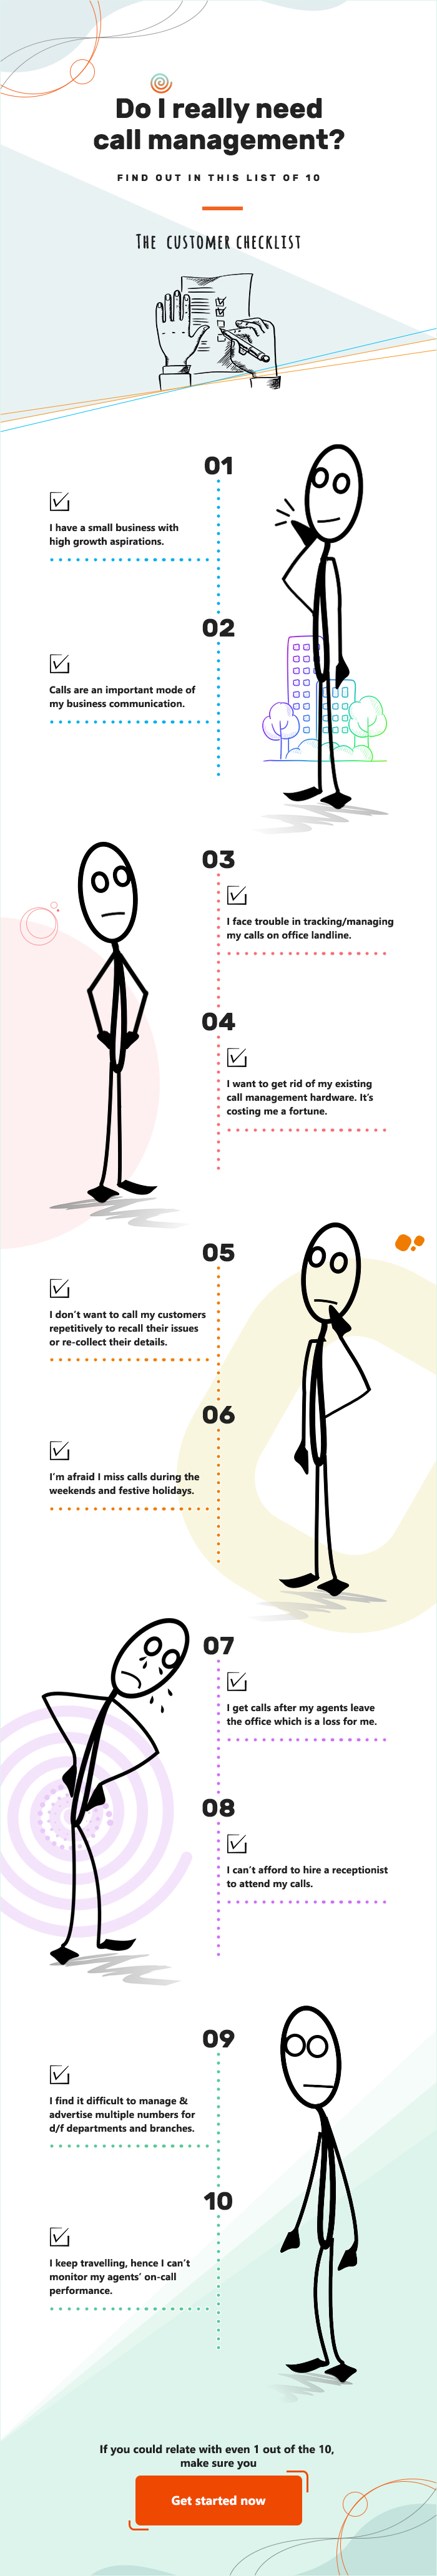 Checklist: Do I need a call management system